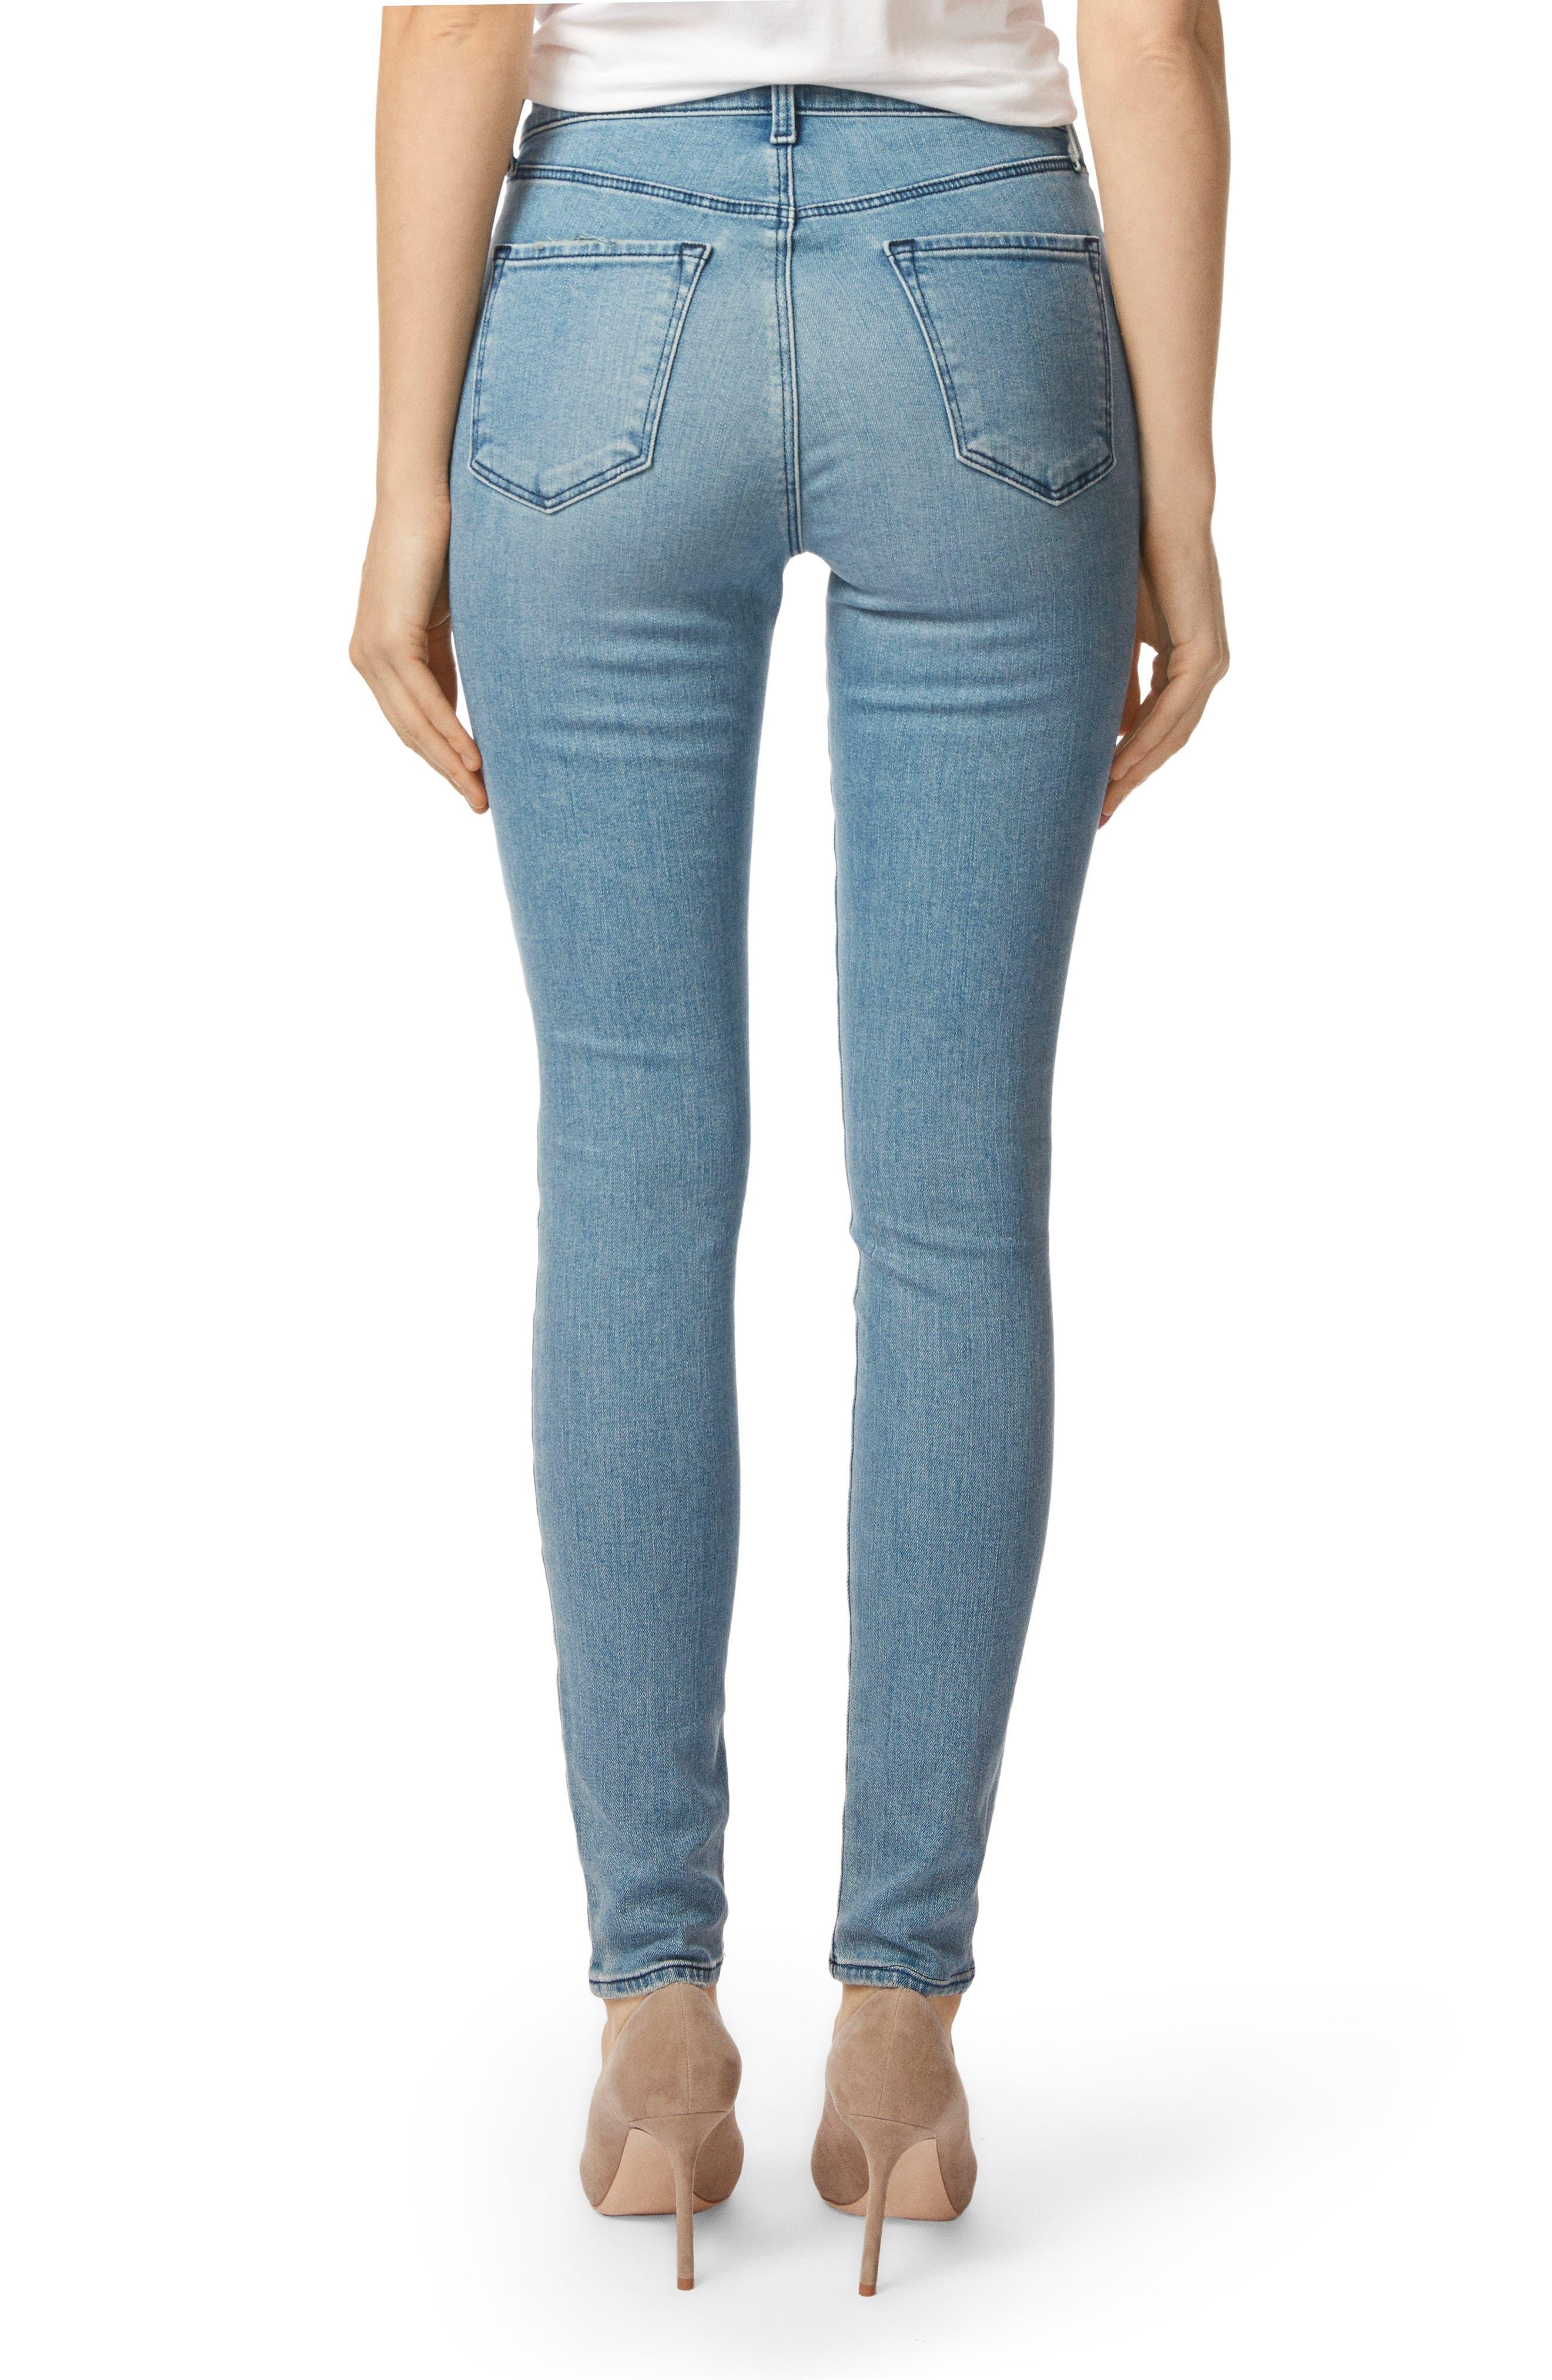 Maria High Waist Skinny Jeans,                             Alternate thumbnail 2, color,                             Patriot